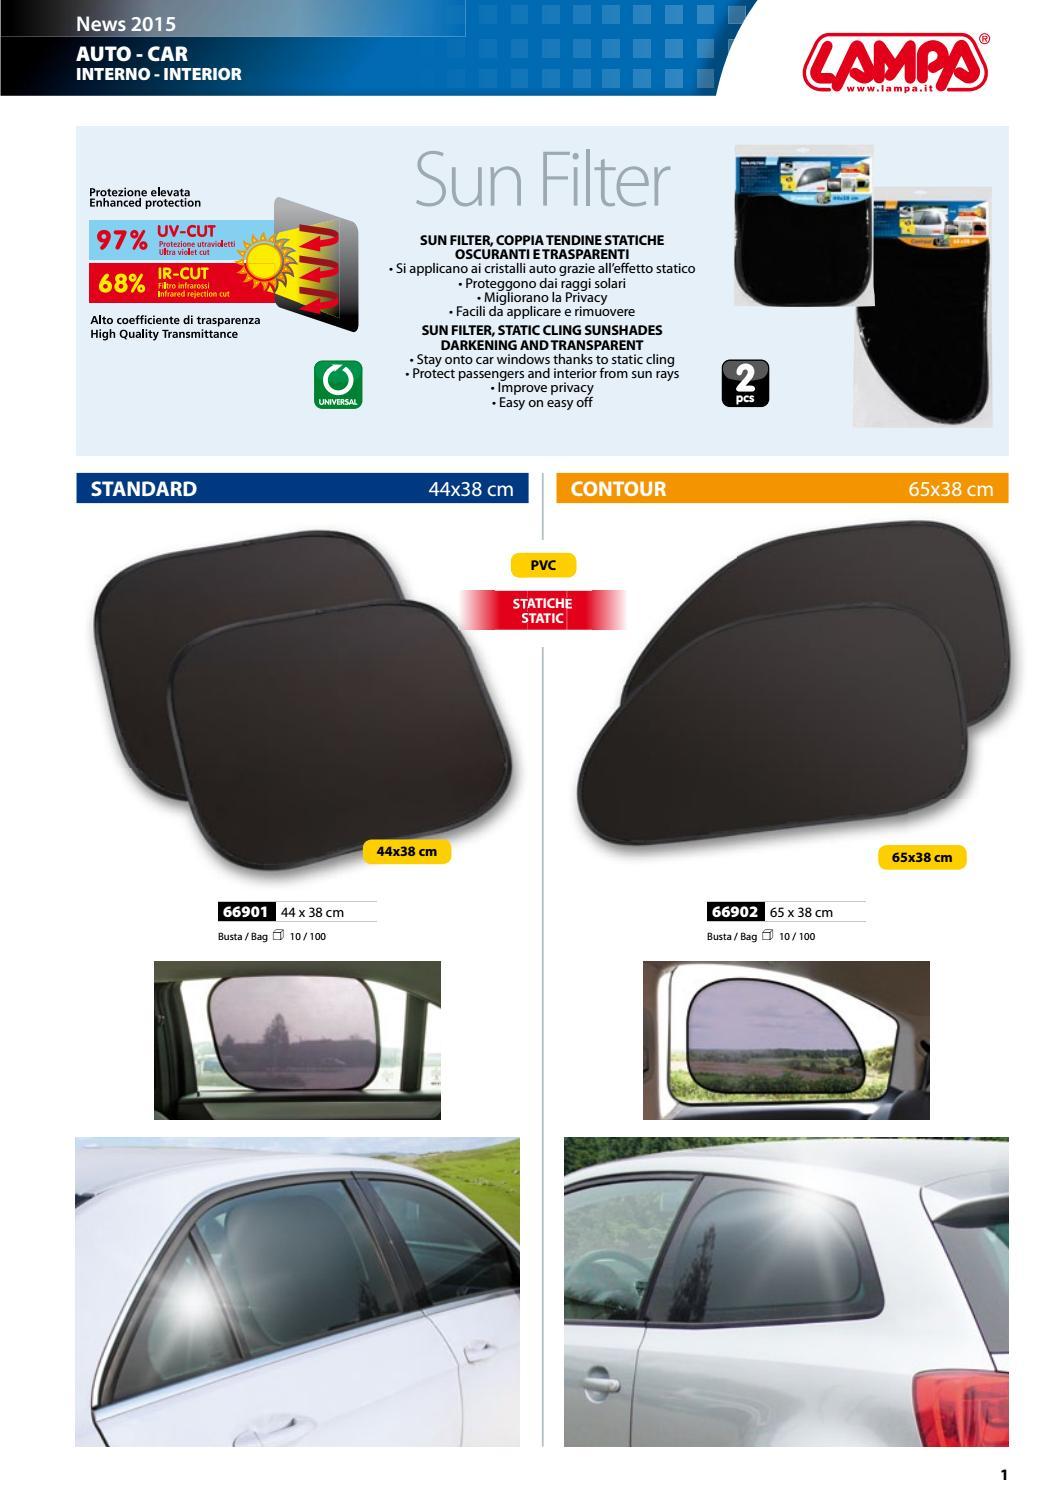 JAGUAR X-TYPE TAPPETI tappetini per AUTO,Qualità OTTIMA 2 block compatibili